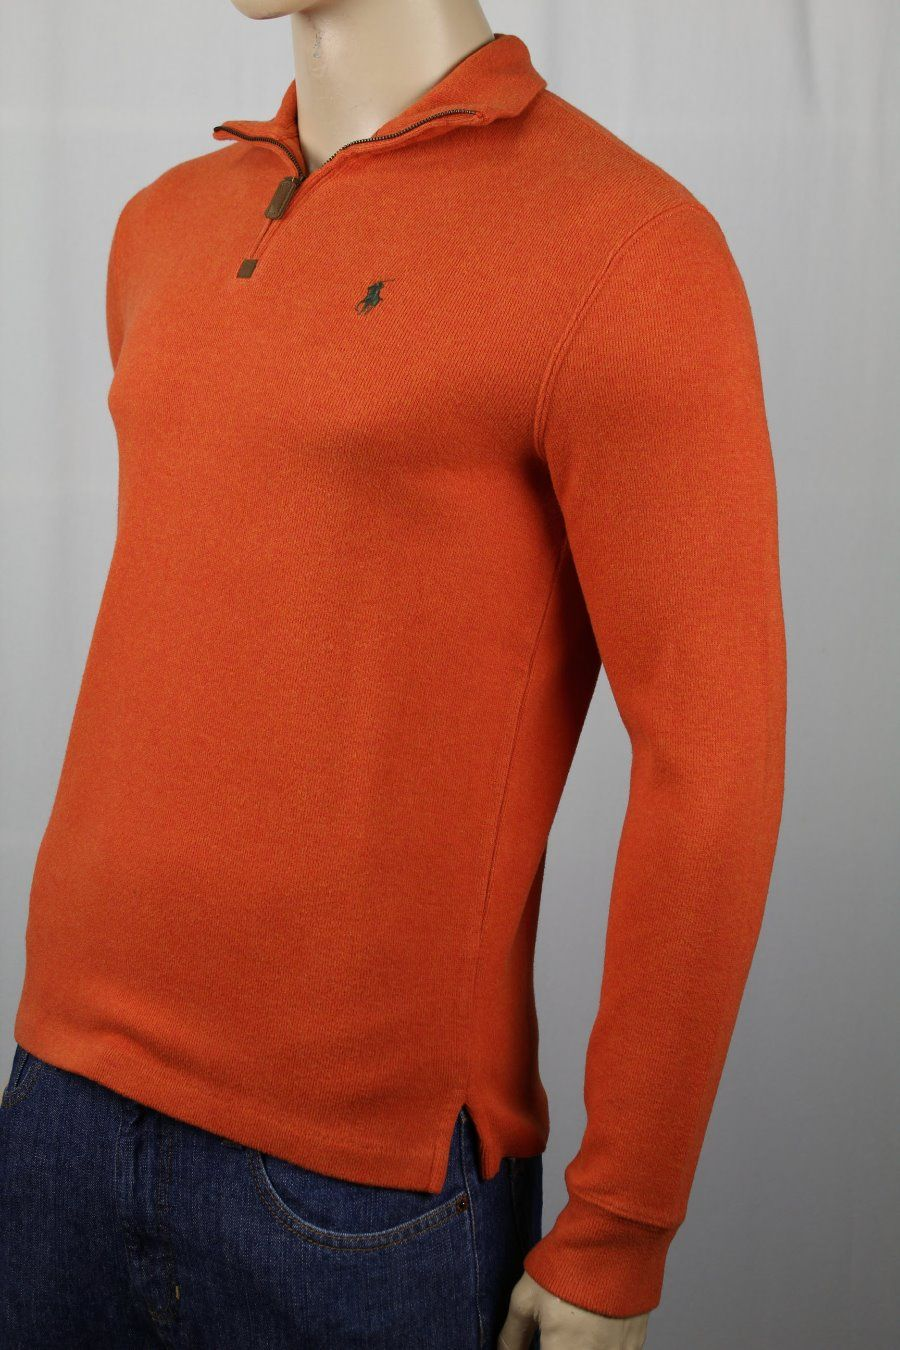 Amy Vermont Viskose Shirt Bluse Gr 700 NEU 36 bis 44 Grün Ton